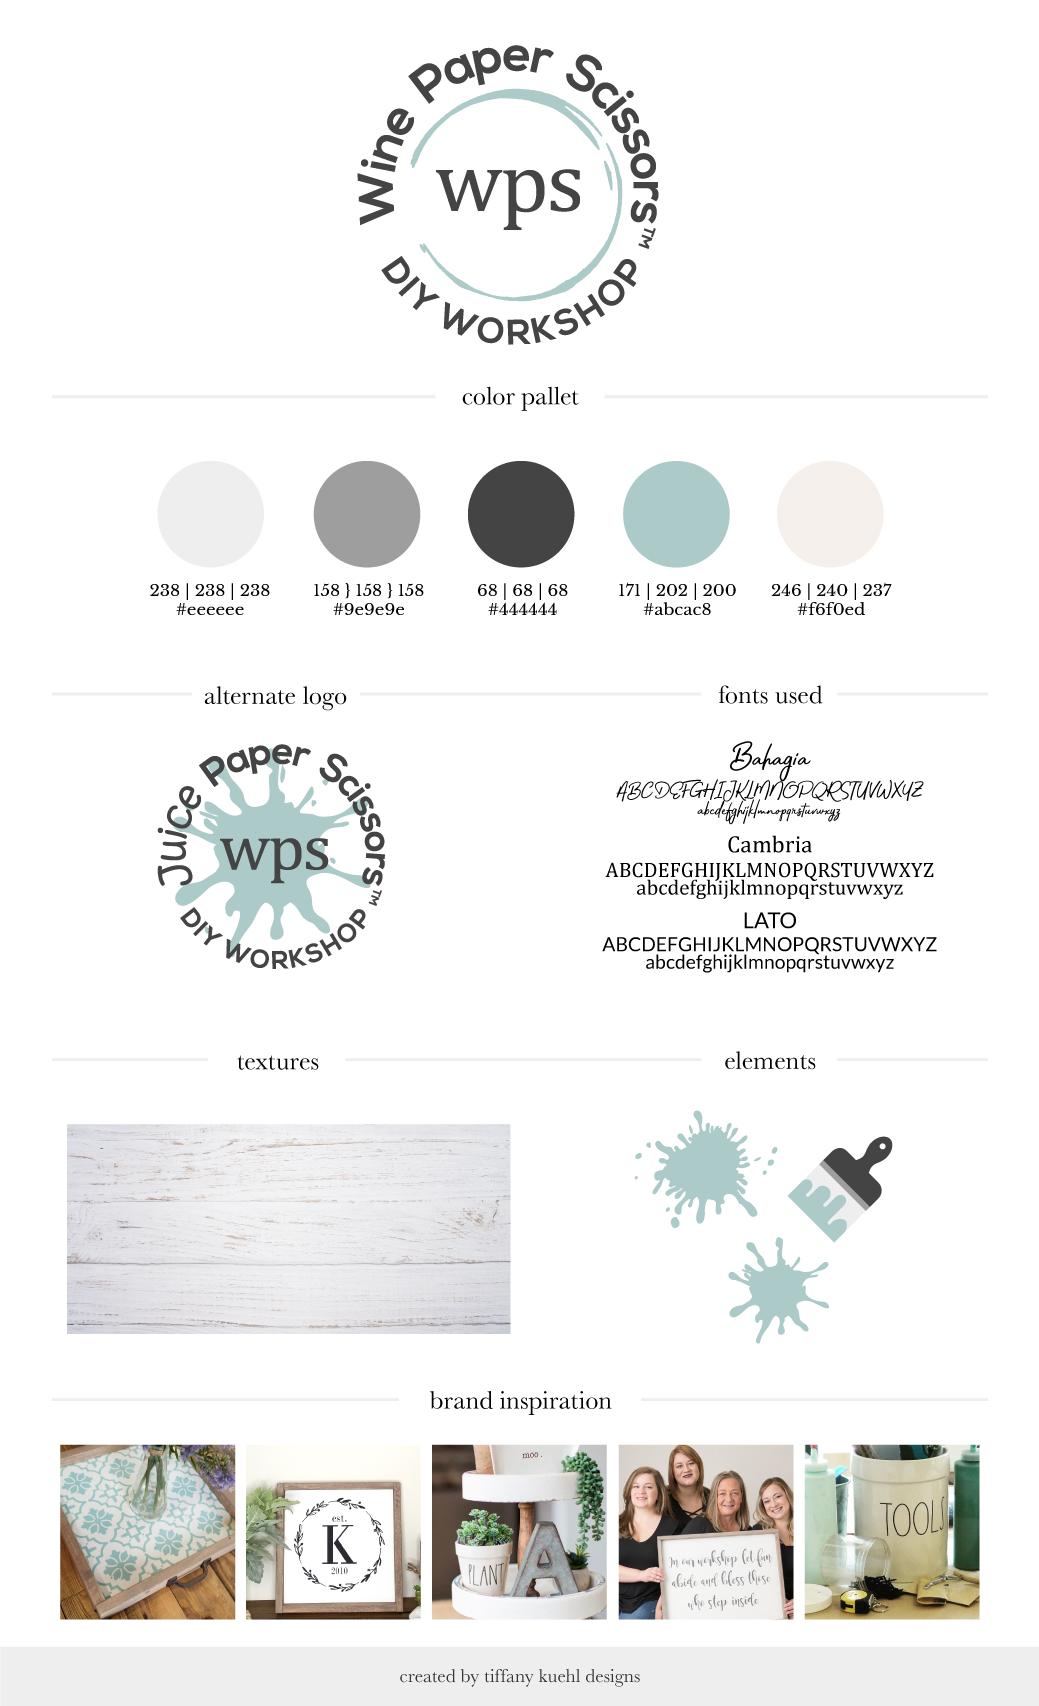 Wine Paper Scissors Brand Board | Tiffany Kuehl Designs